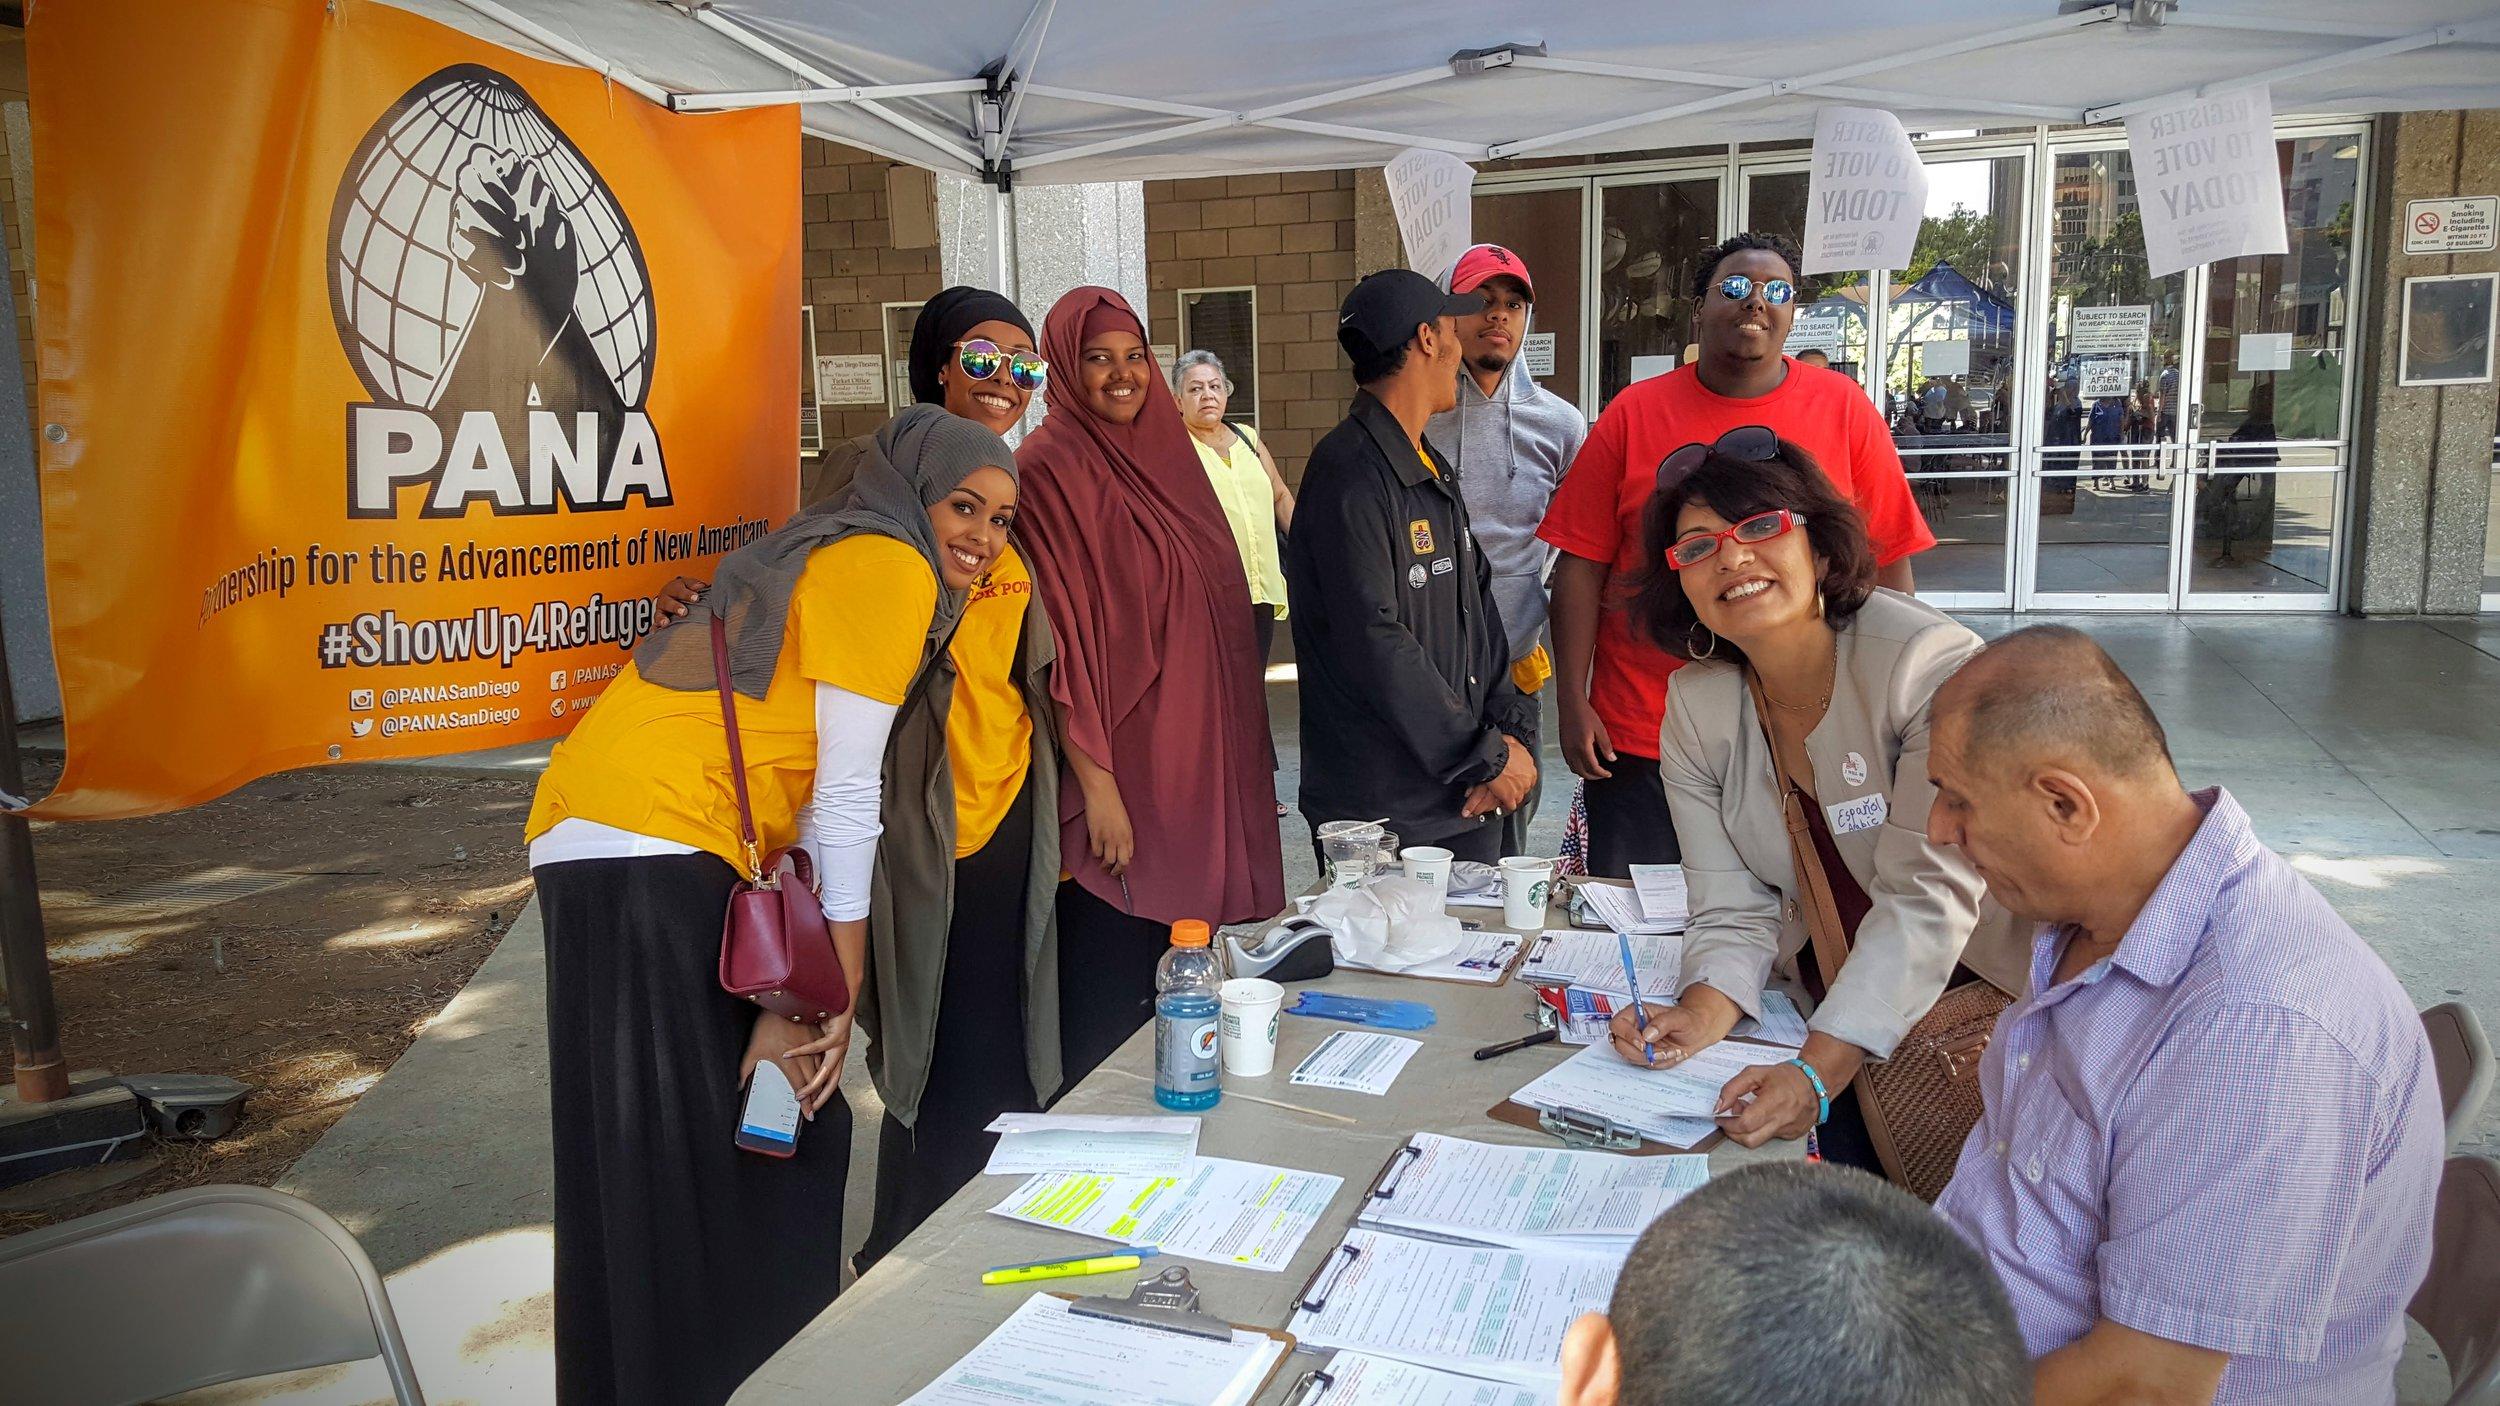 Summer Voter Registration Drive - 731 new voters